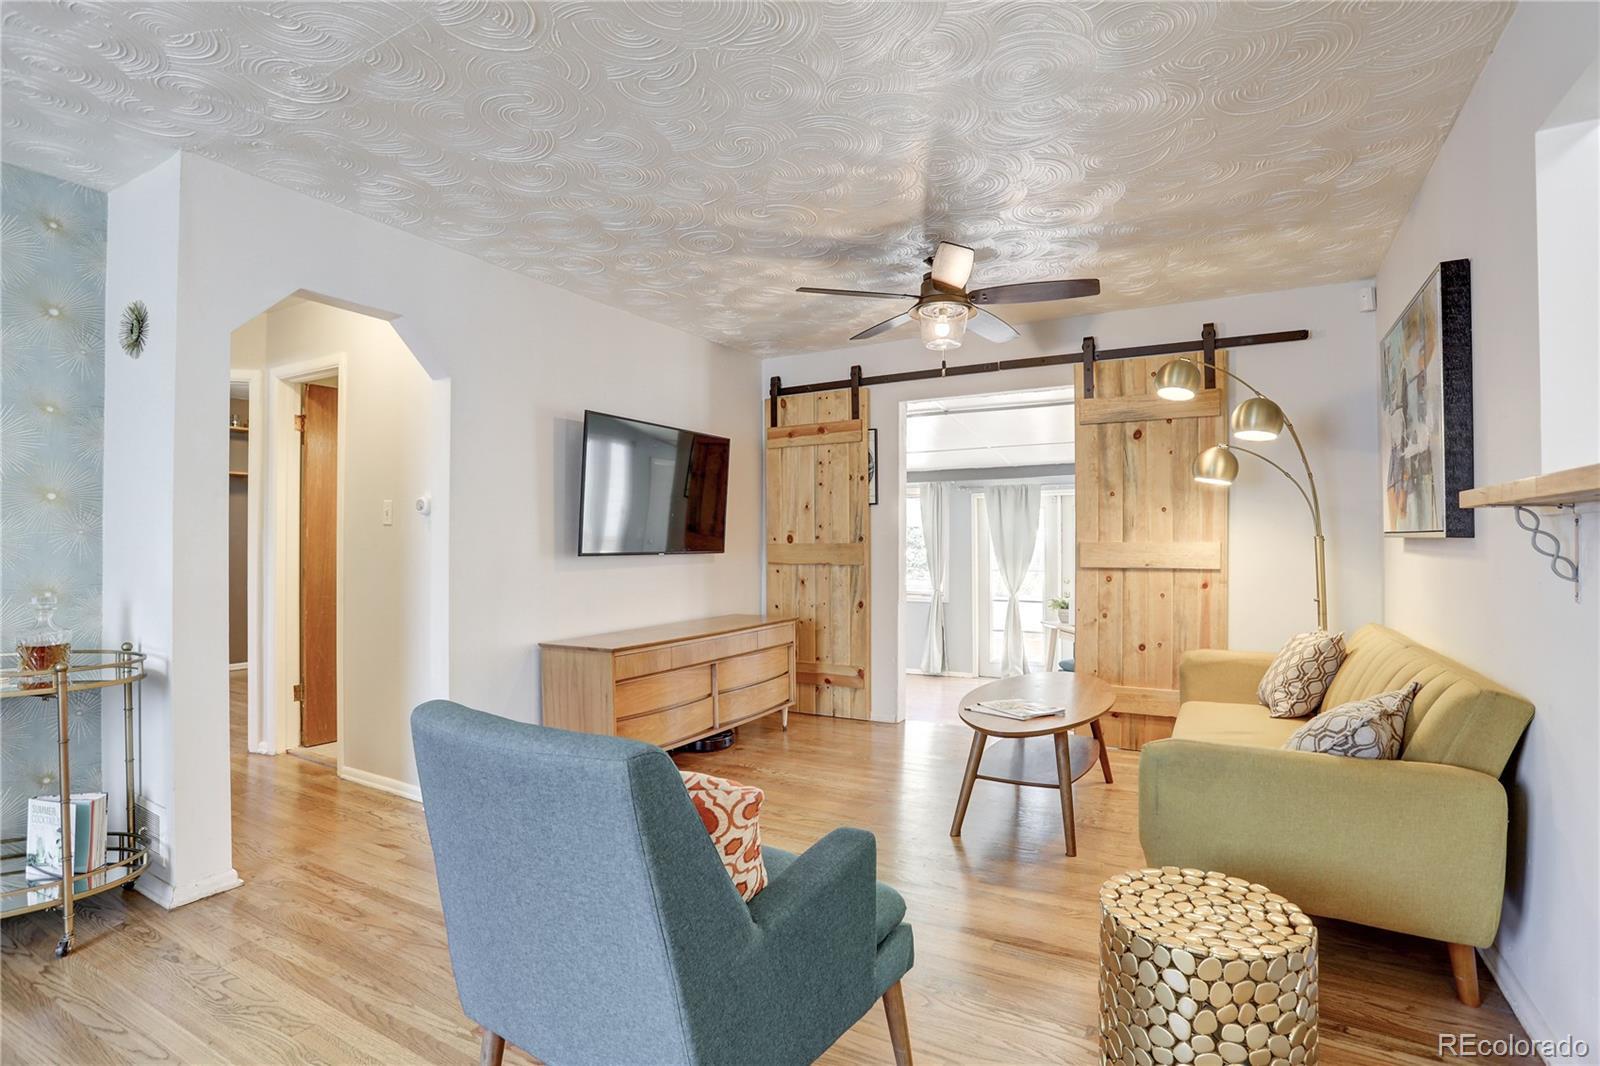 1066 S Canosa Court Property Photo - Denver, CO real estate listing